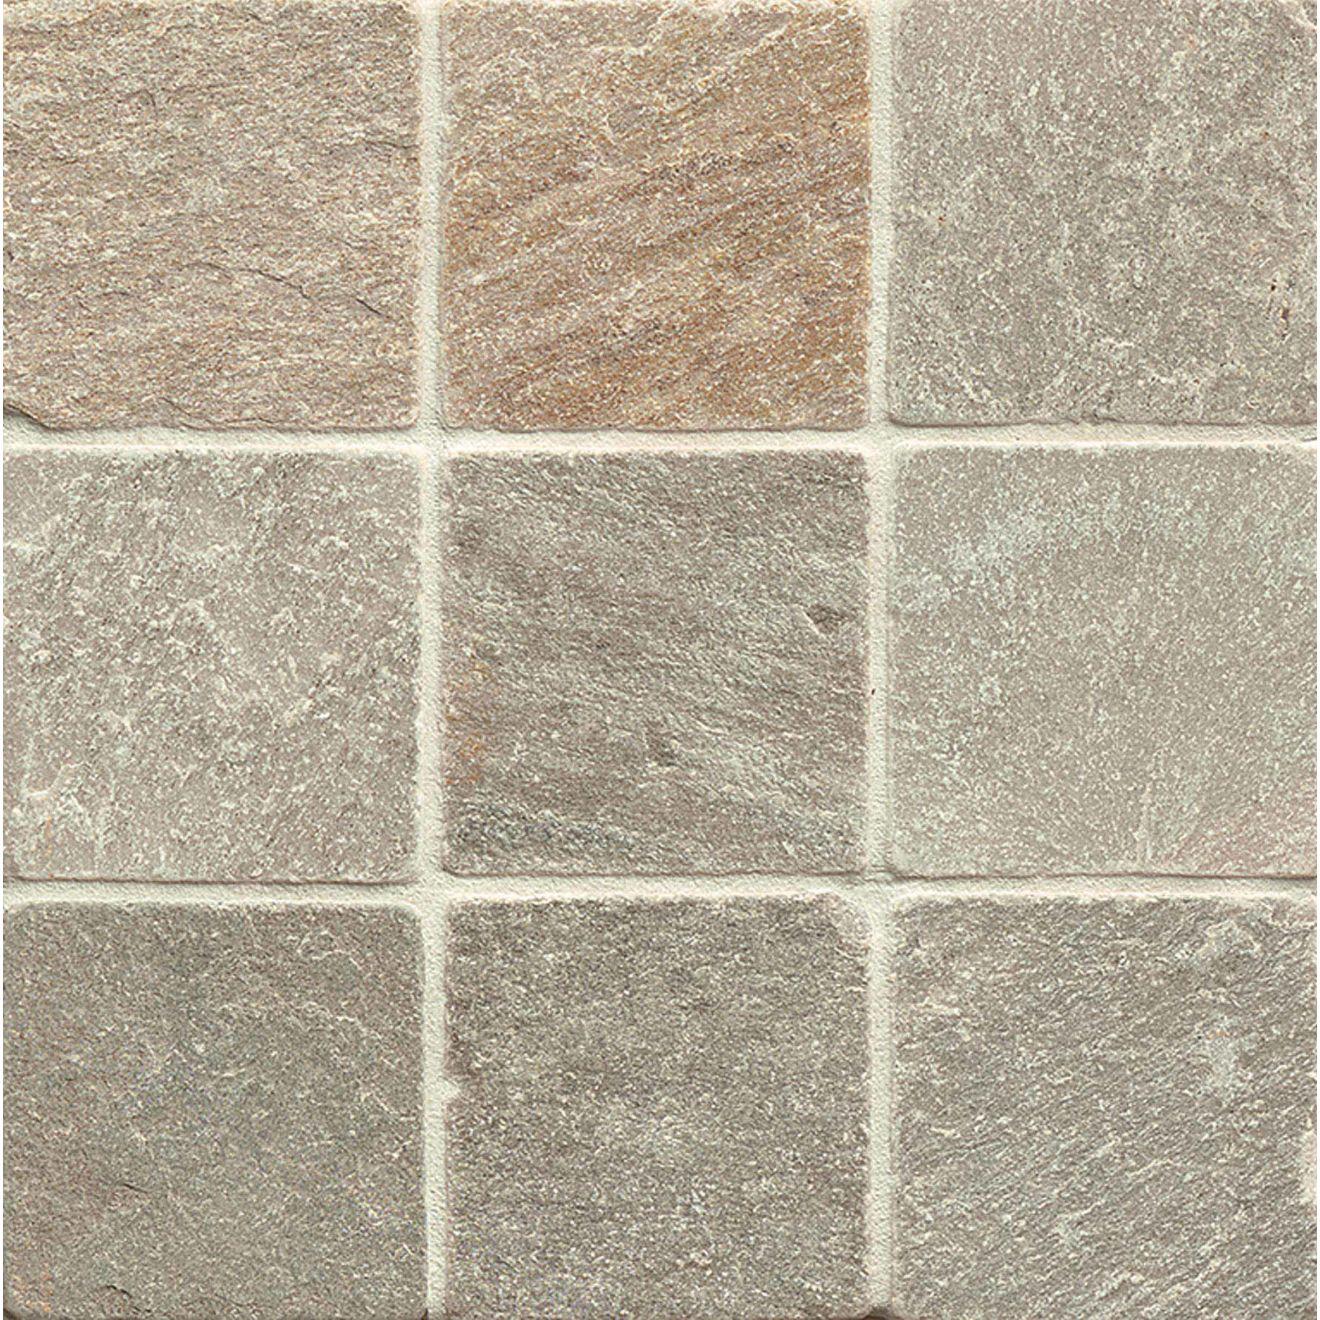 "Amber Gold 4"" x 4"" Floor Tile"